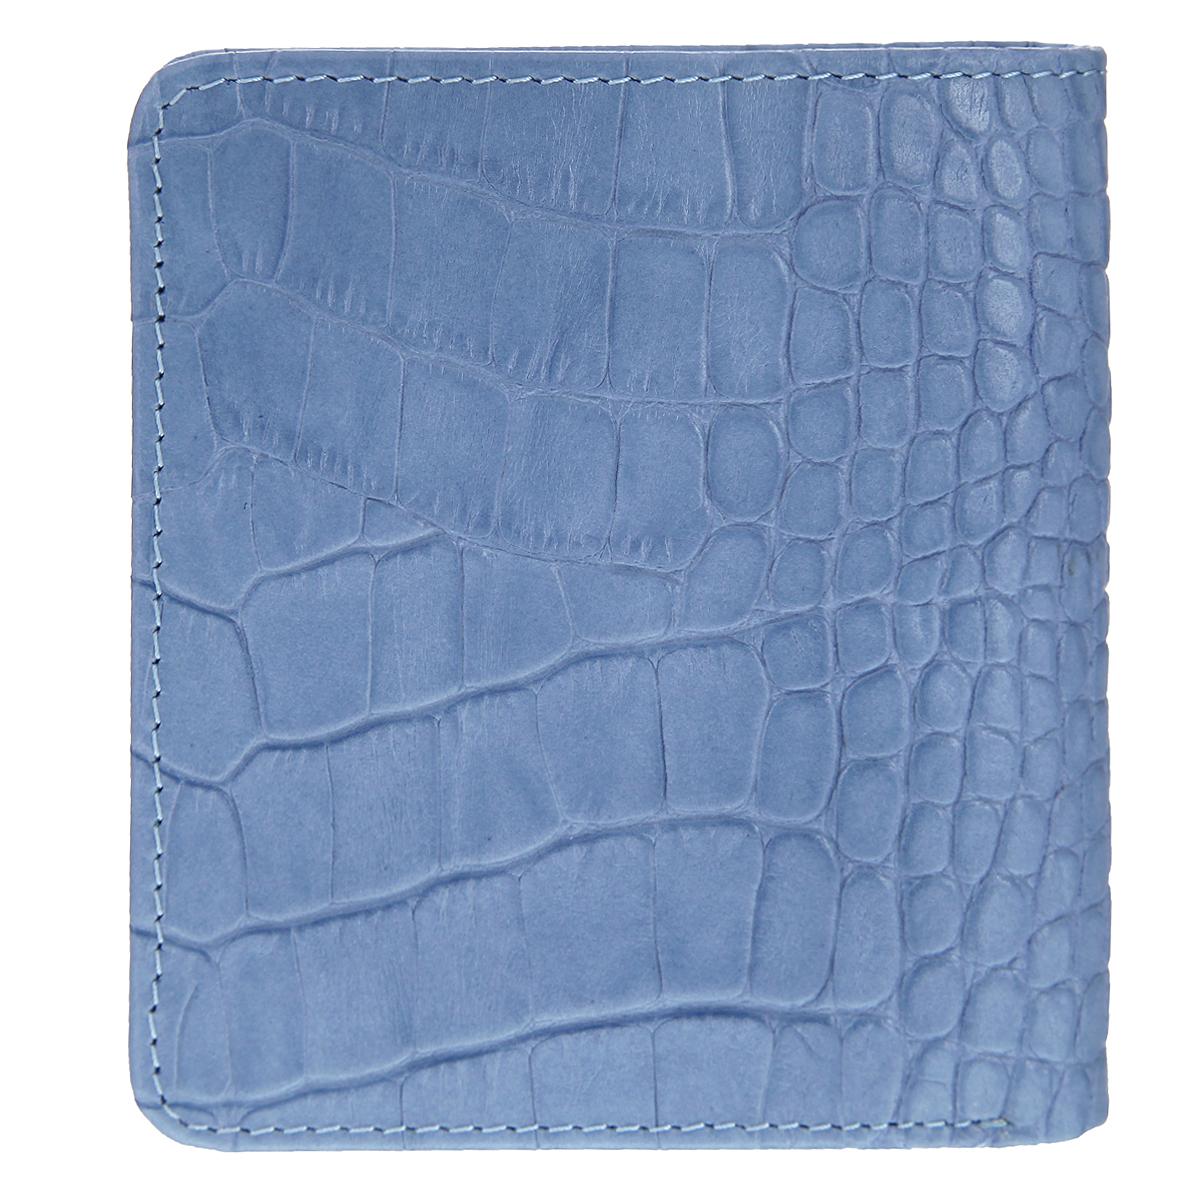 "Портмоне ""Tirelli"", цвет: голубой. 15-311-21"